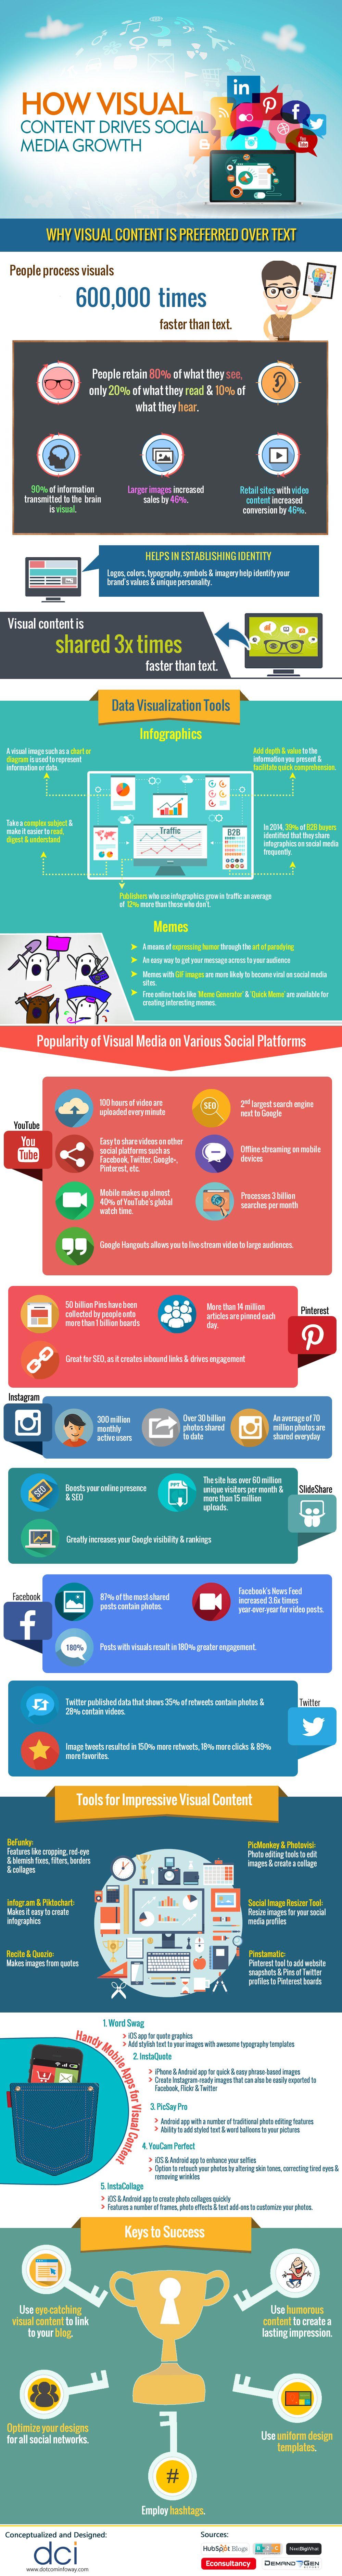 How Visual Content Drives Social Media Growth #infographic #SocialMedia #ContentMarketing